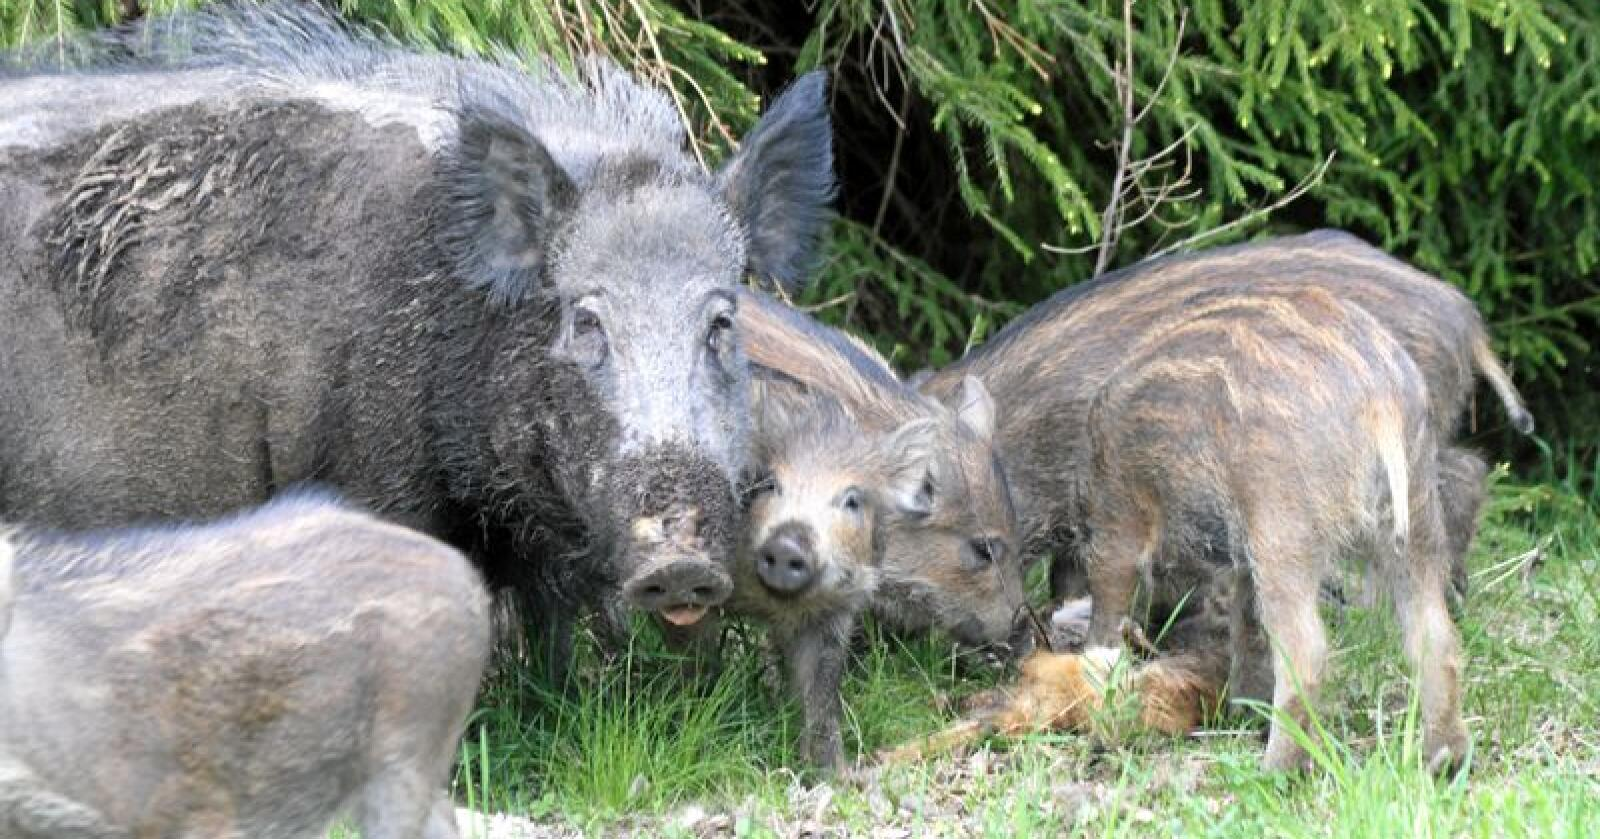 Det er påvist afrikansk svinepest hos villsvin i Tyskland. Foto: Mostphotos